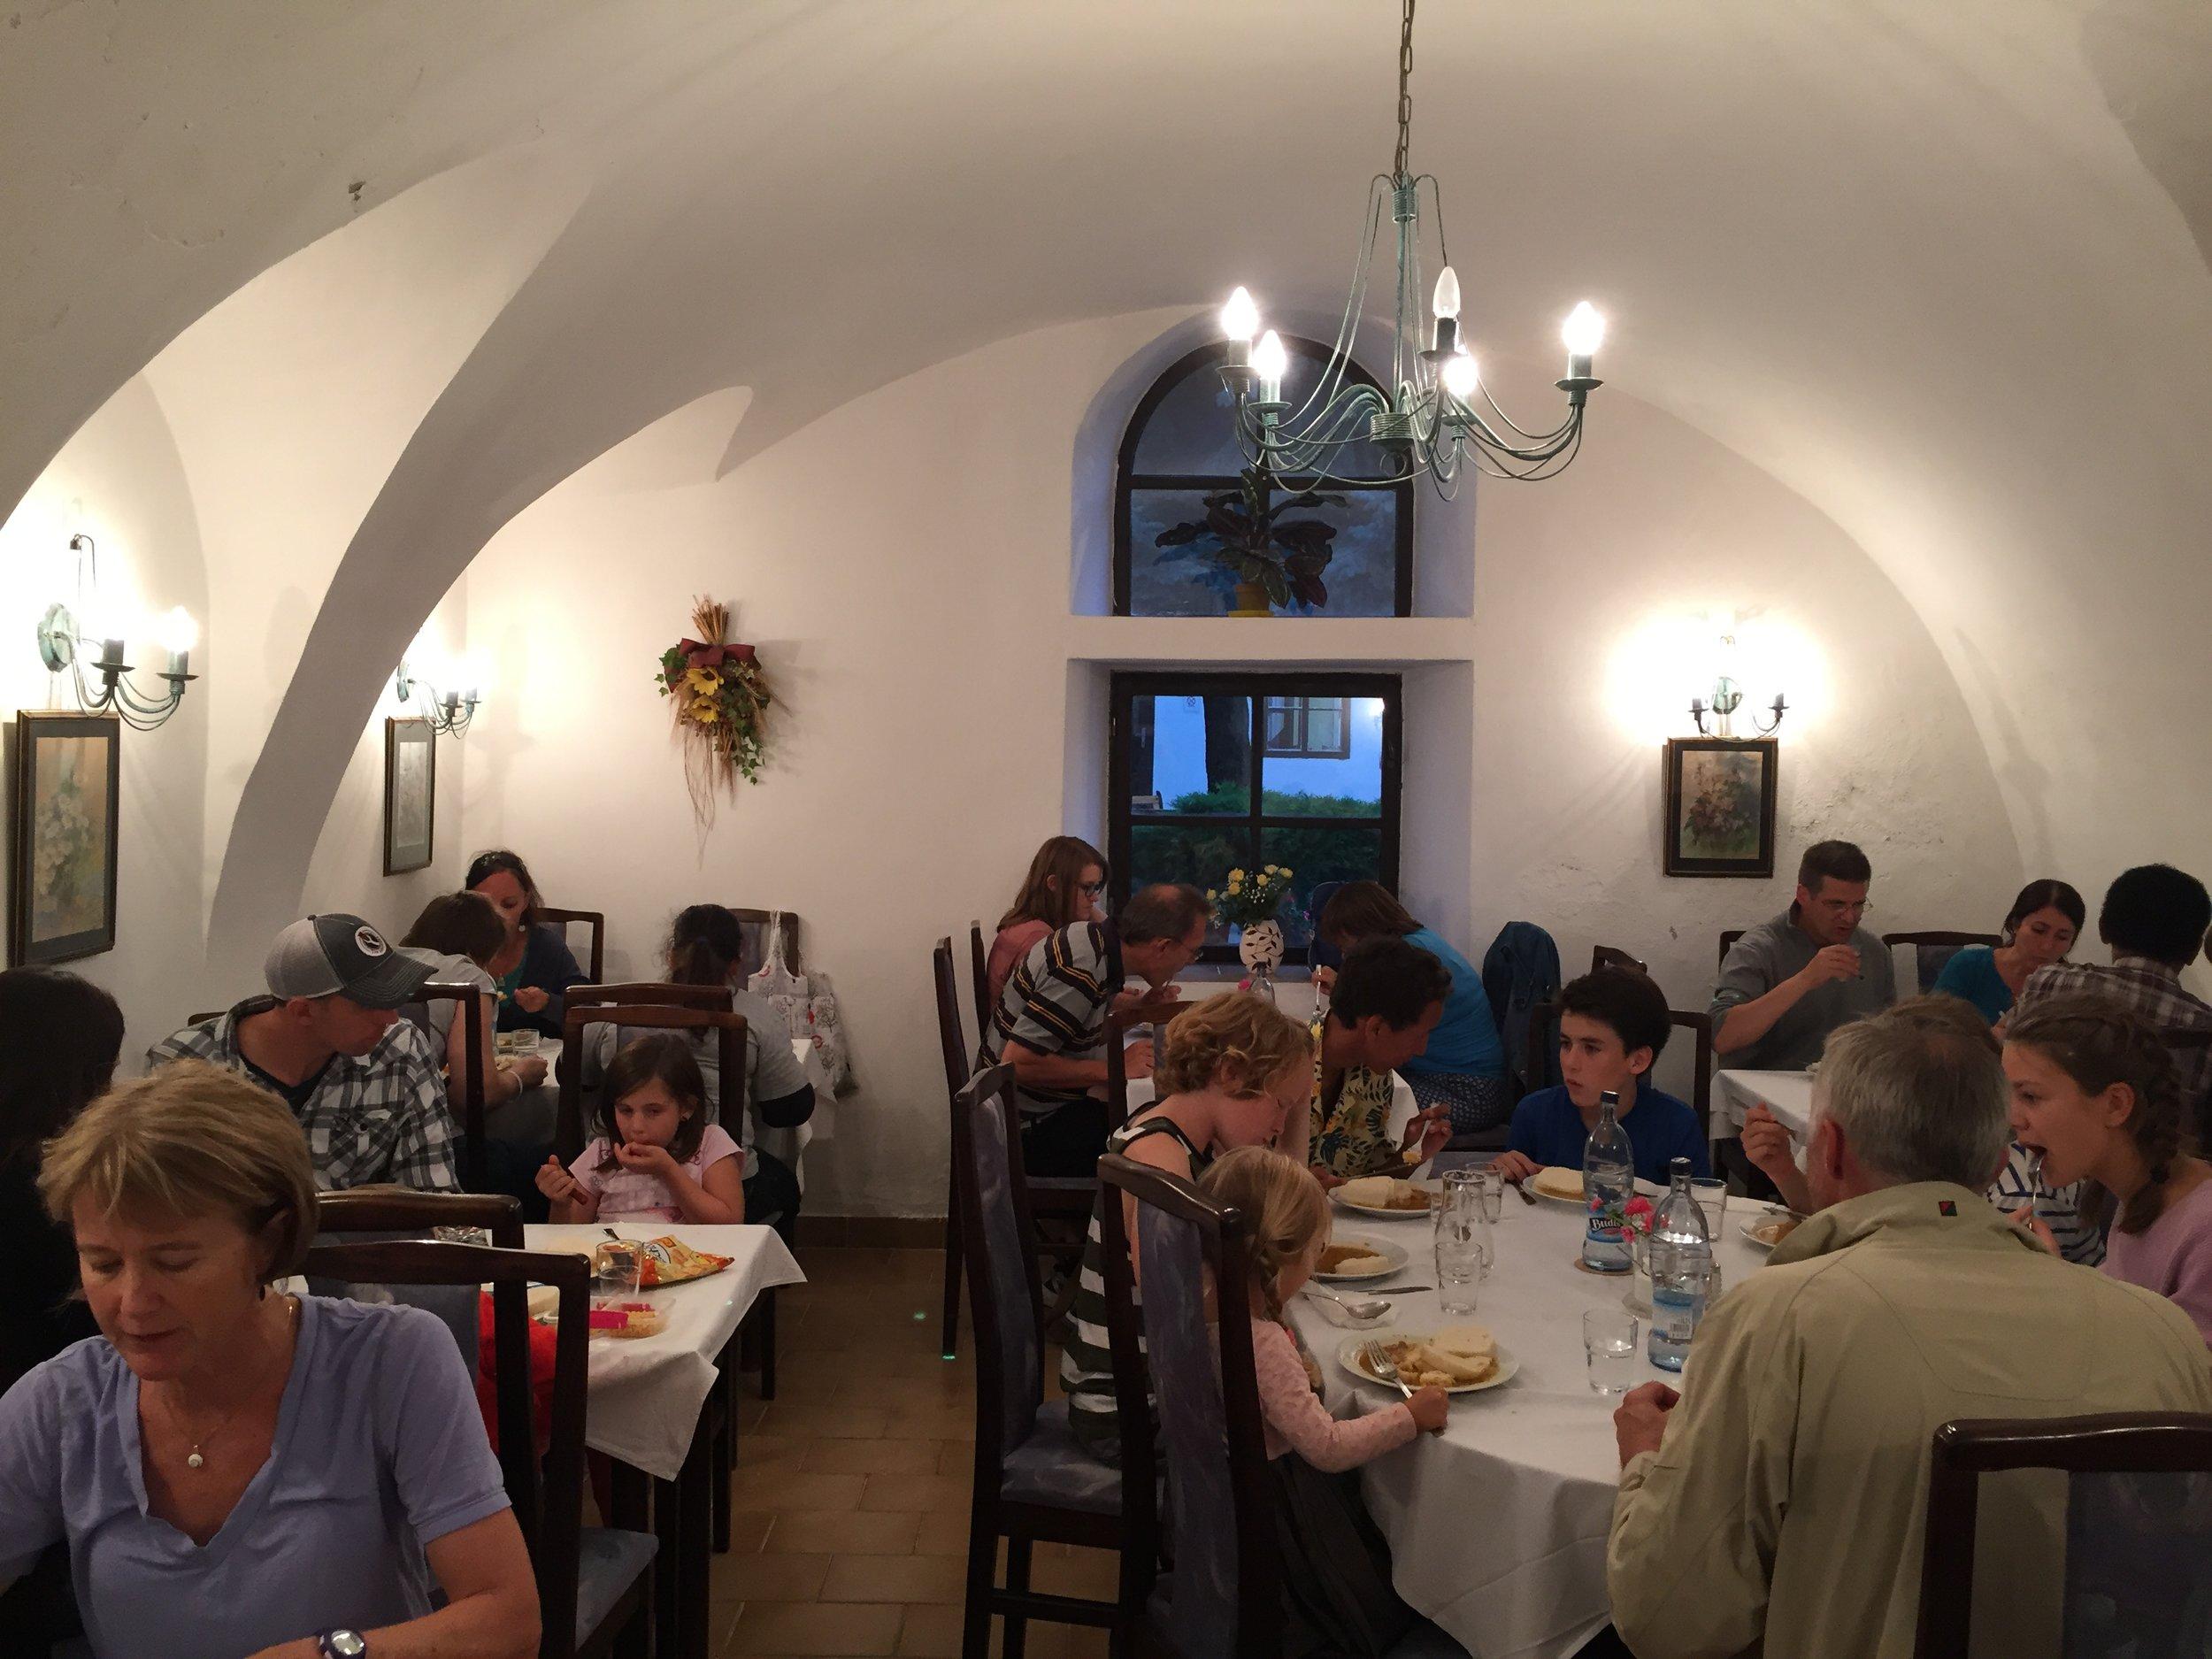 Dining at the Agape Centre, Svaty Jur